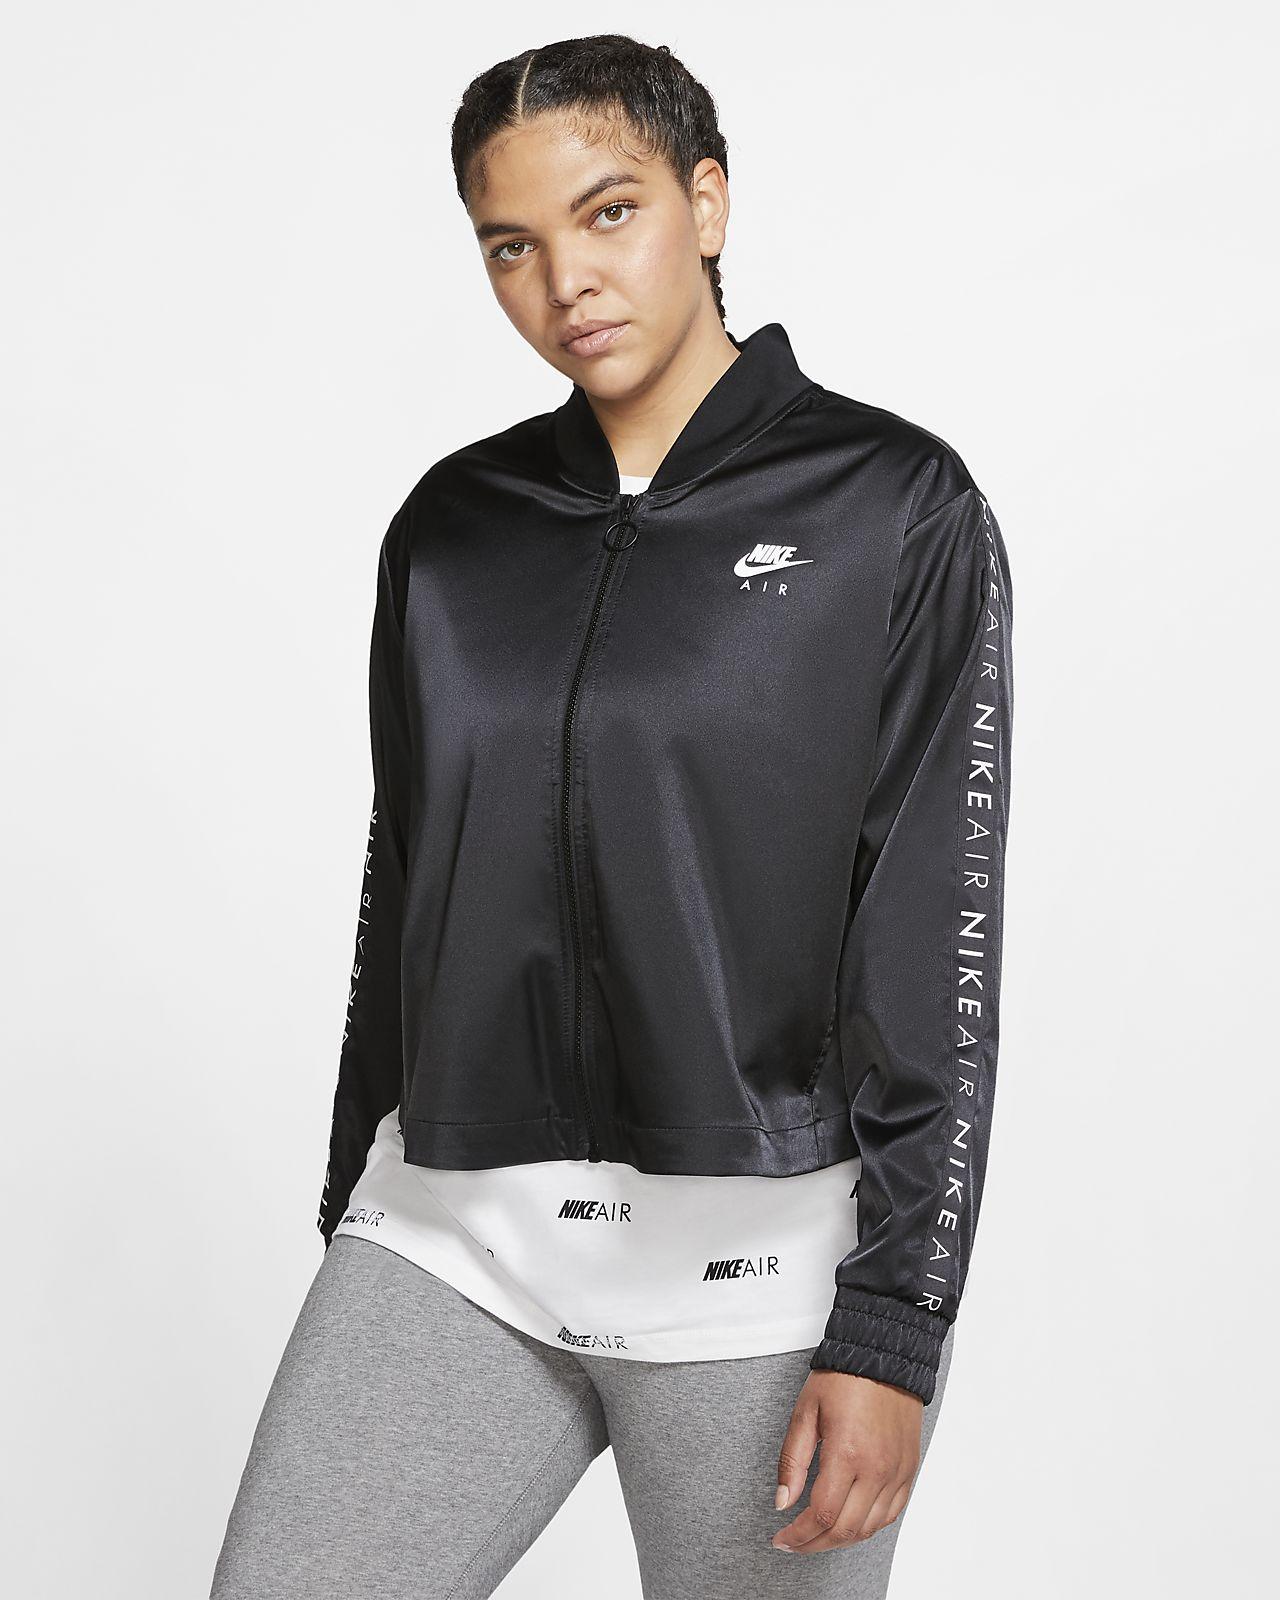 Nike Air Chaqueta deportiva de satén (Talla grande) - Mujer